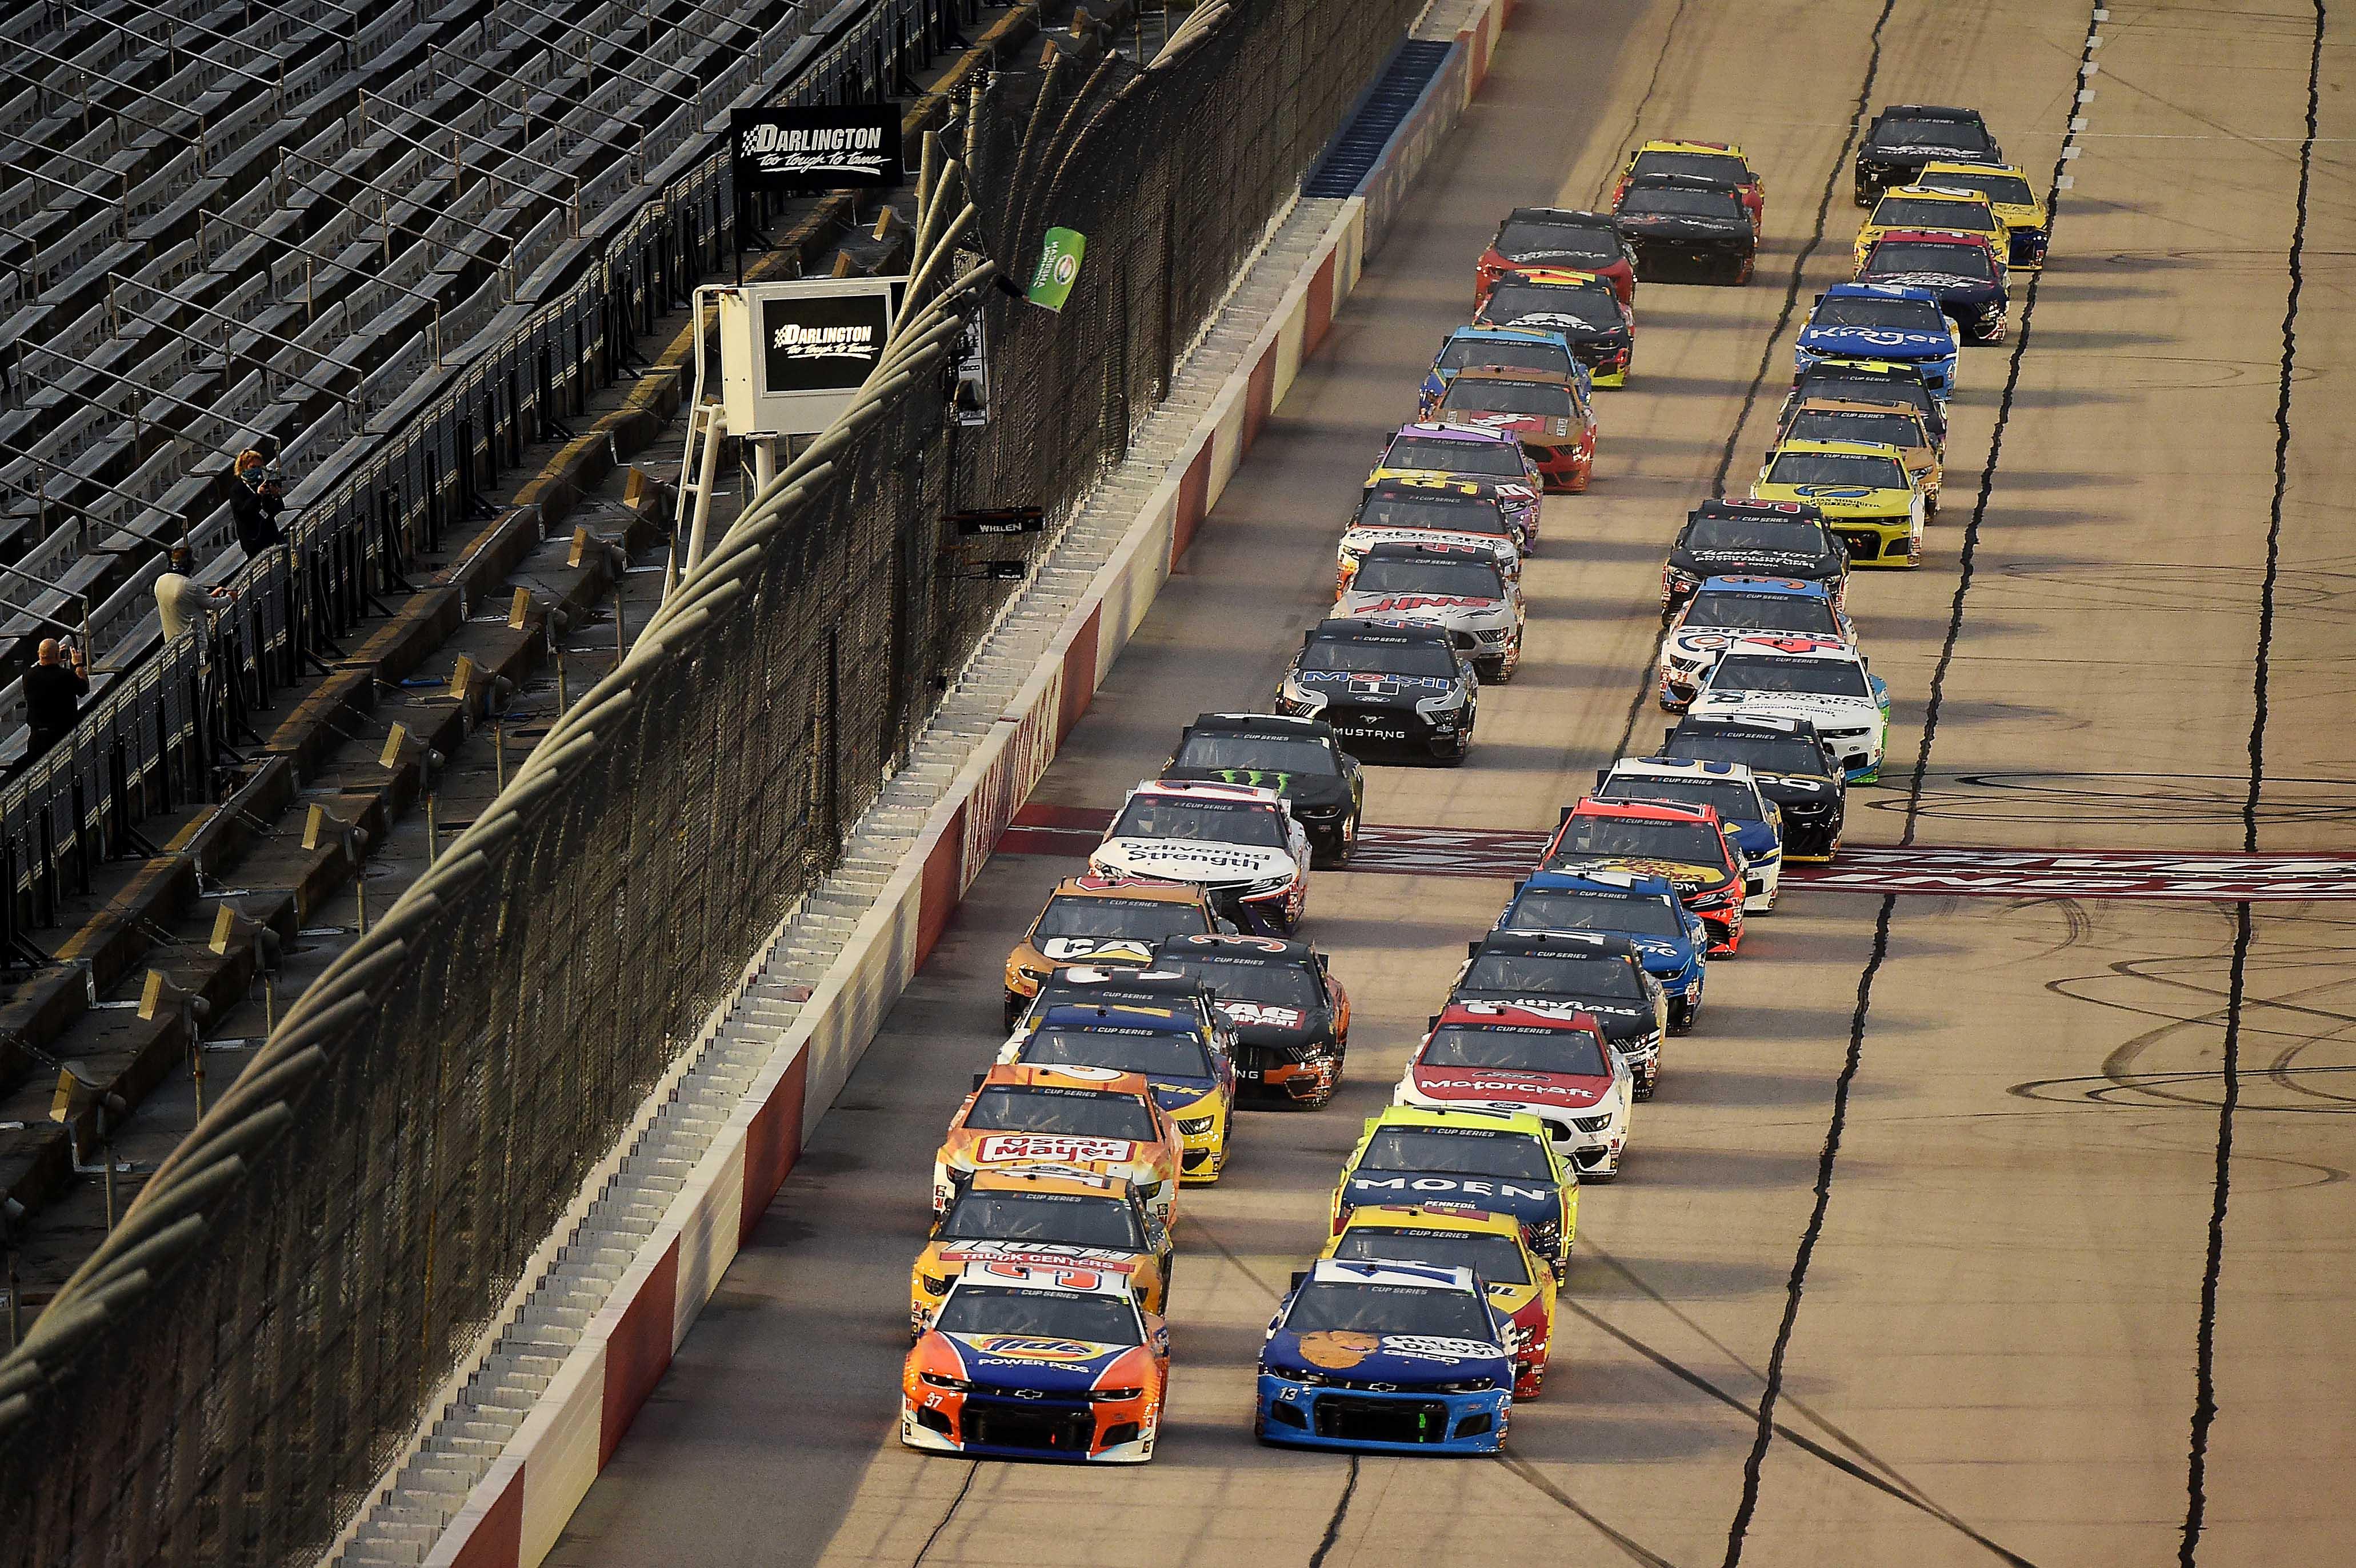 Darlington Race Results: May 20, 2020 (NASCAR Cup Series) - Racing News